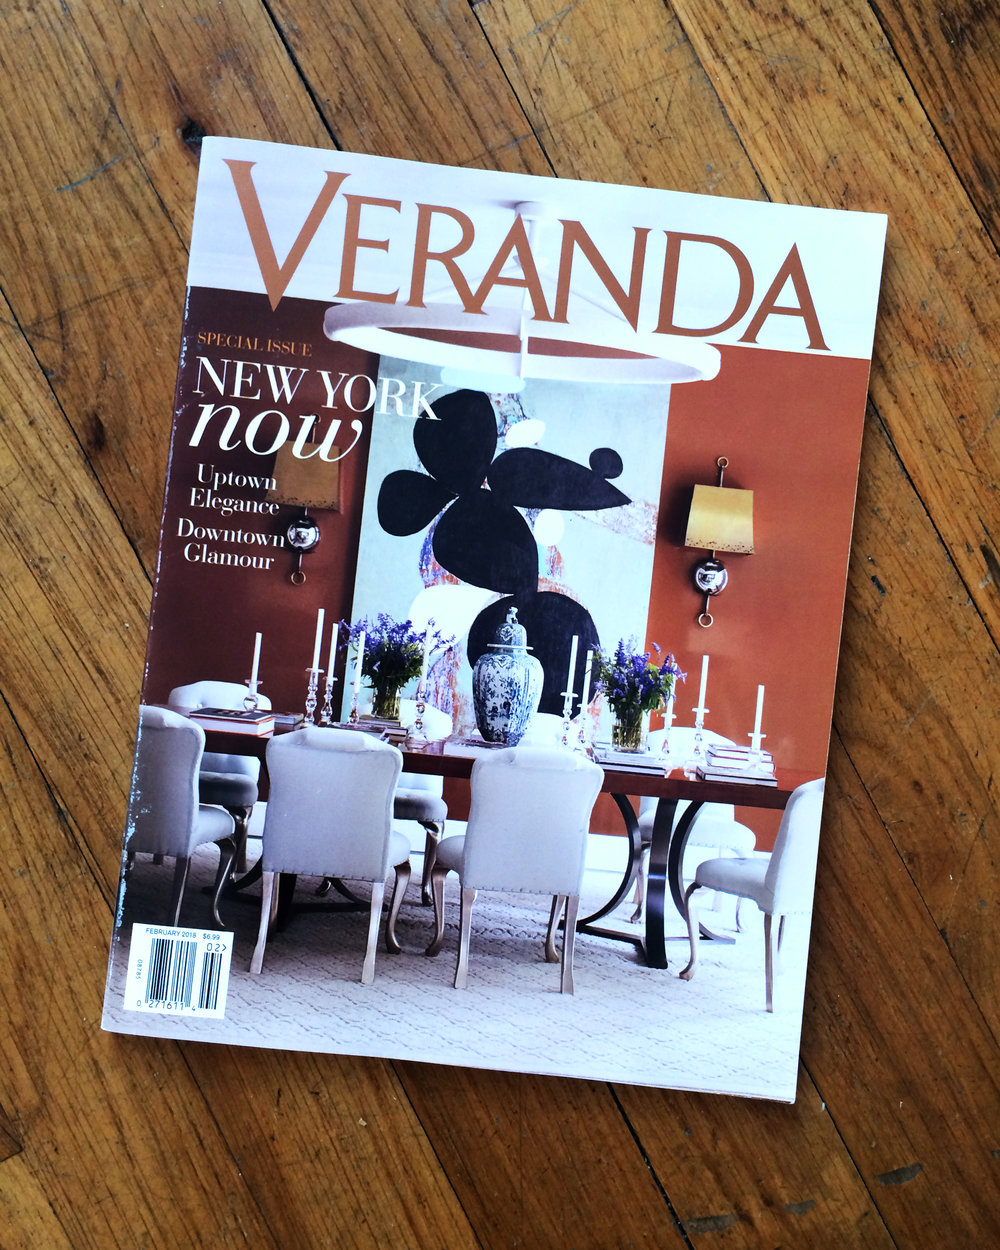 VerandaCover.jpg